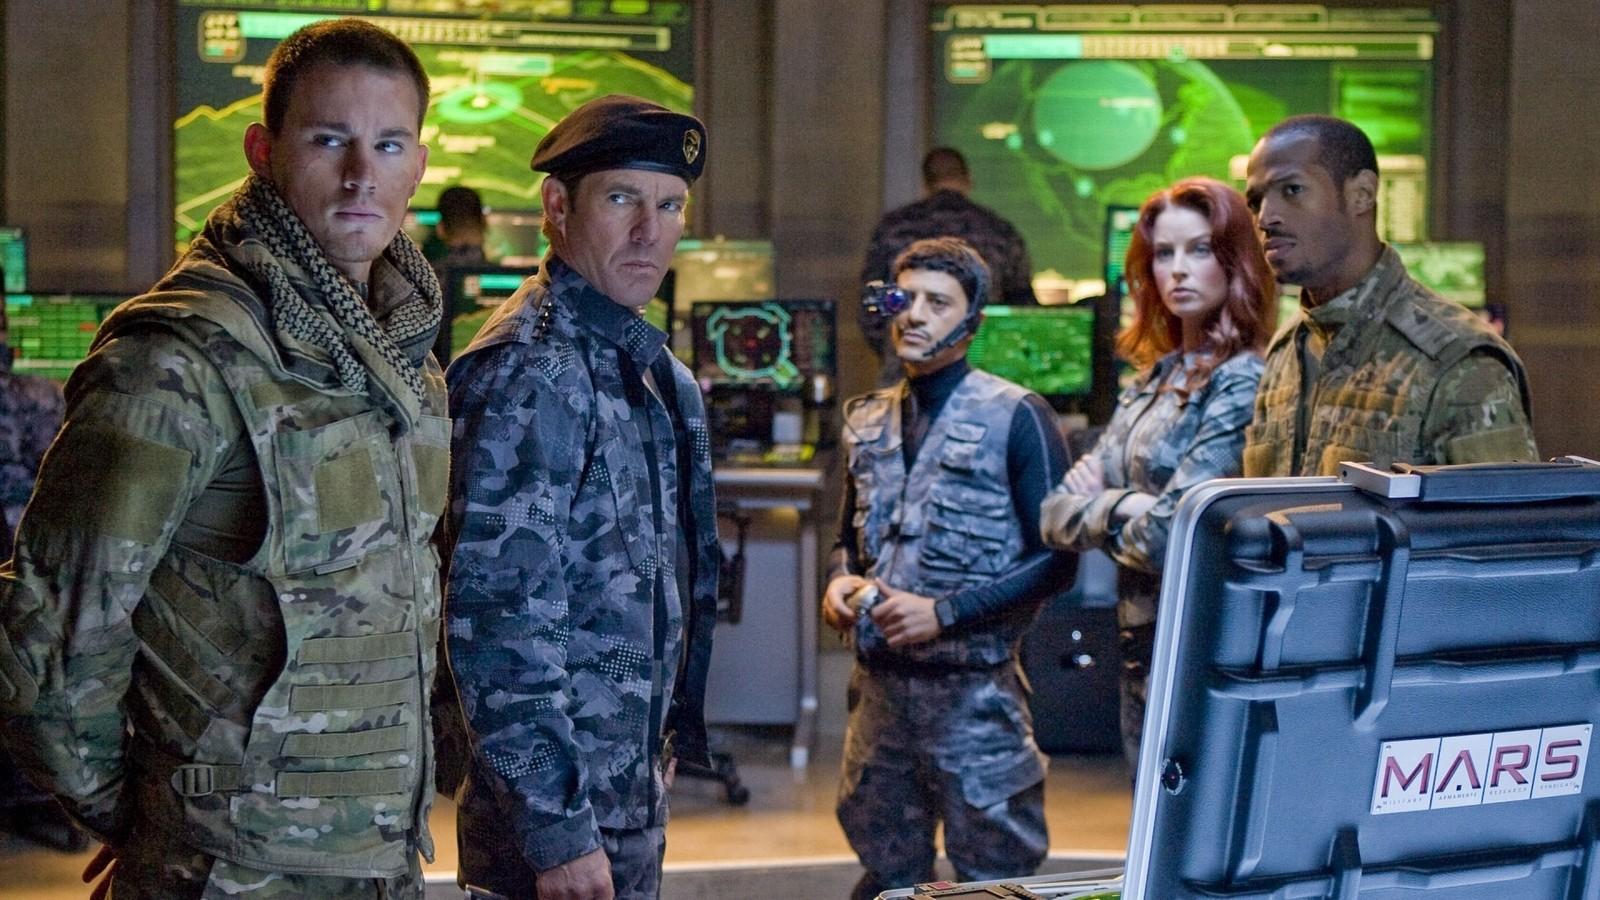 The G.I. Joe Team - Duke (Channing Tatum), Hawk (Dennis Quaid), Breaker (Saïd Taghmaoui), Scarlett (Rachel Nichols) and Ripcord (Marlon Wayans) in G.I. Joe: The Rise of the Cobra (2009)